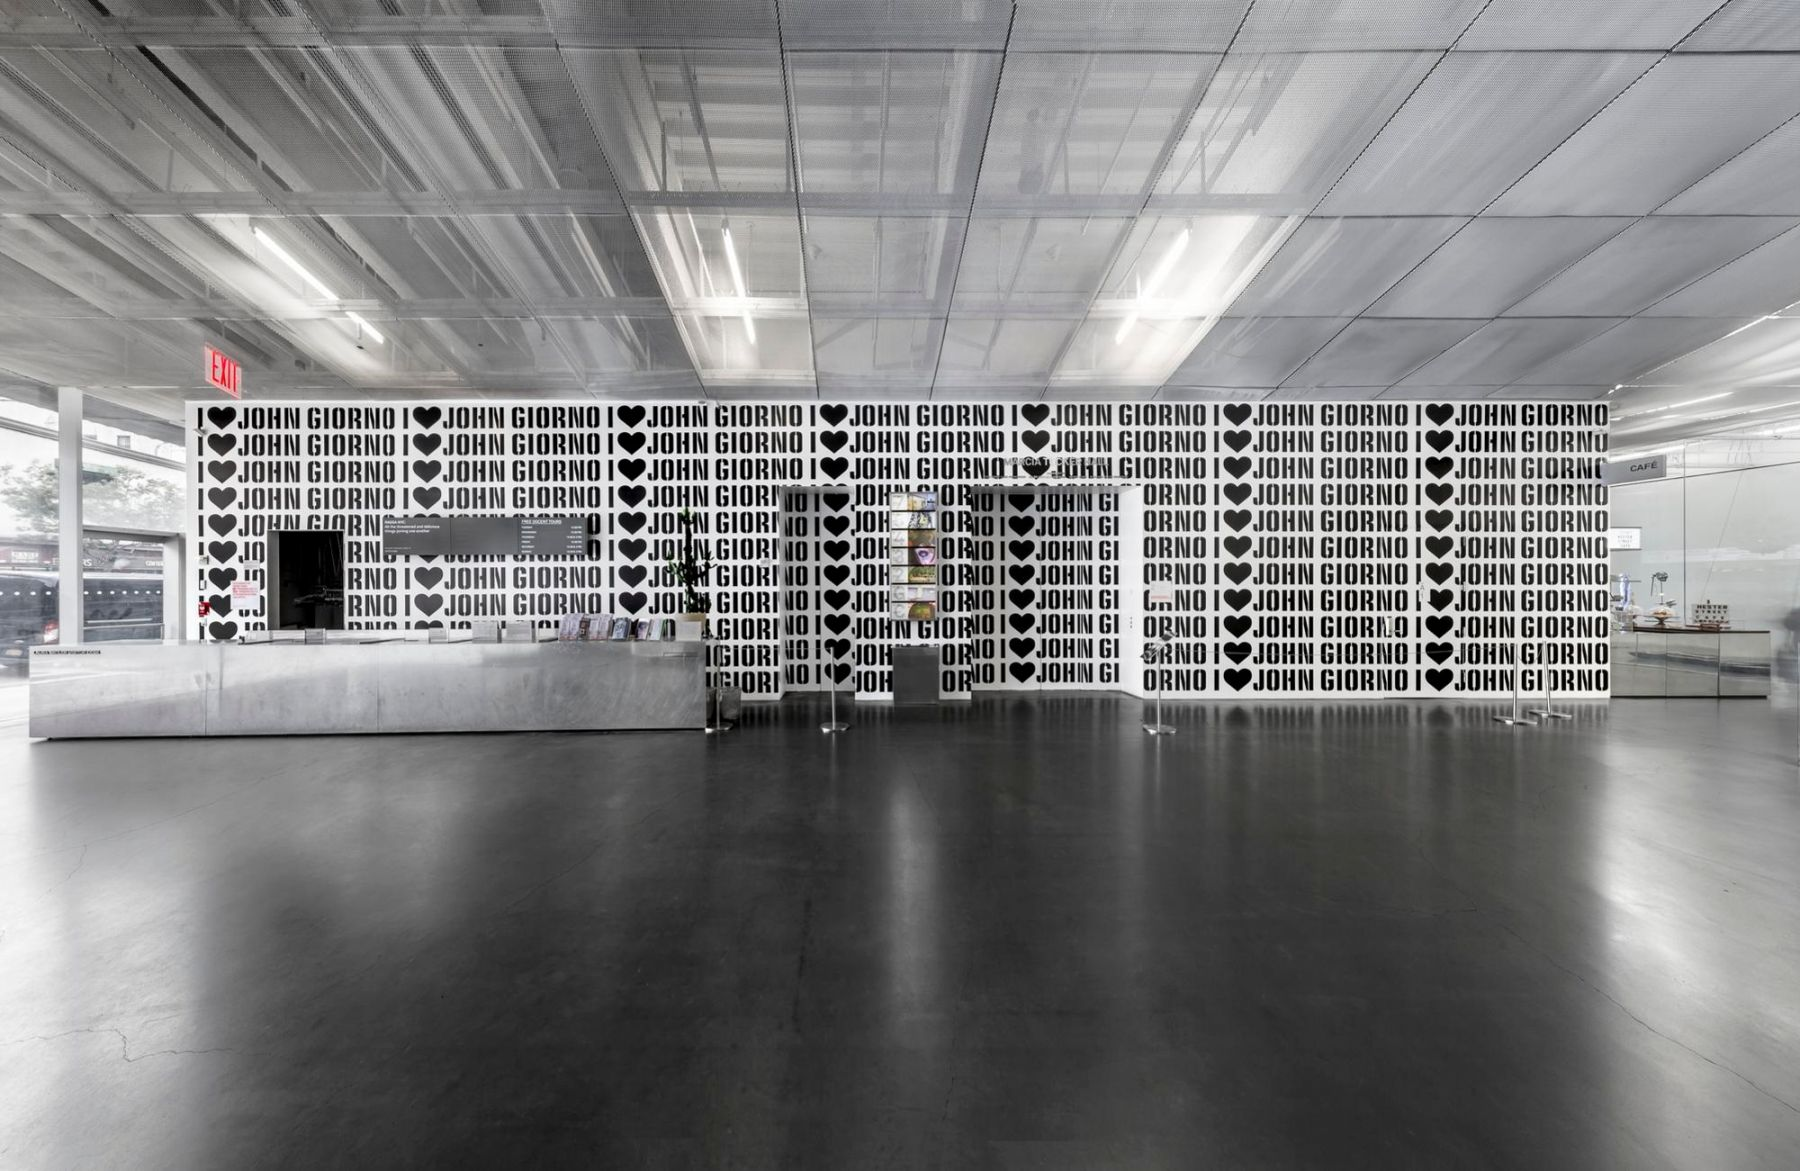 Ugo Rondinone, I Love John Giorno installation views, 2017